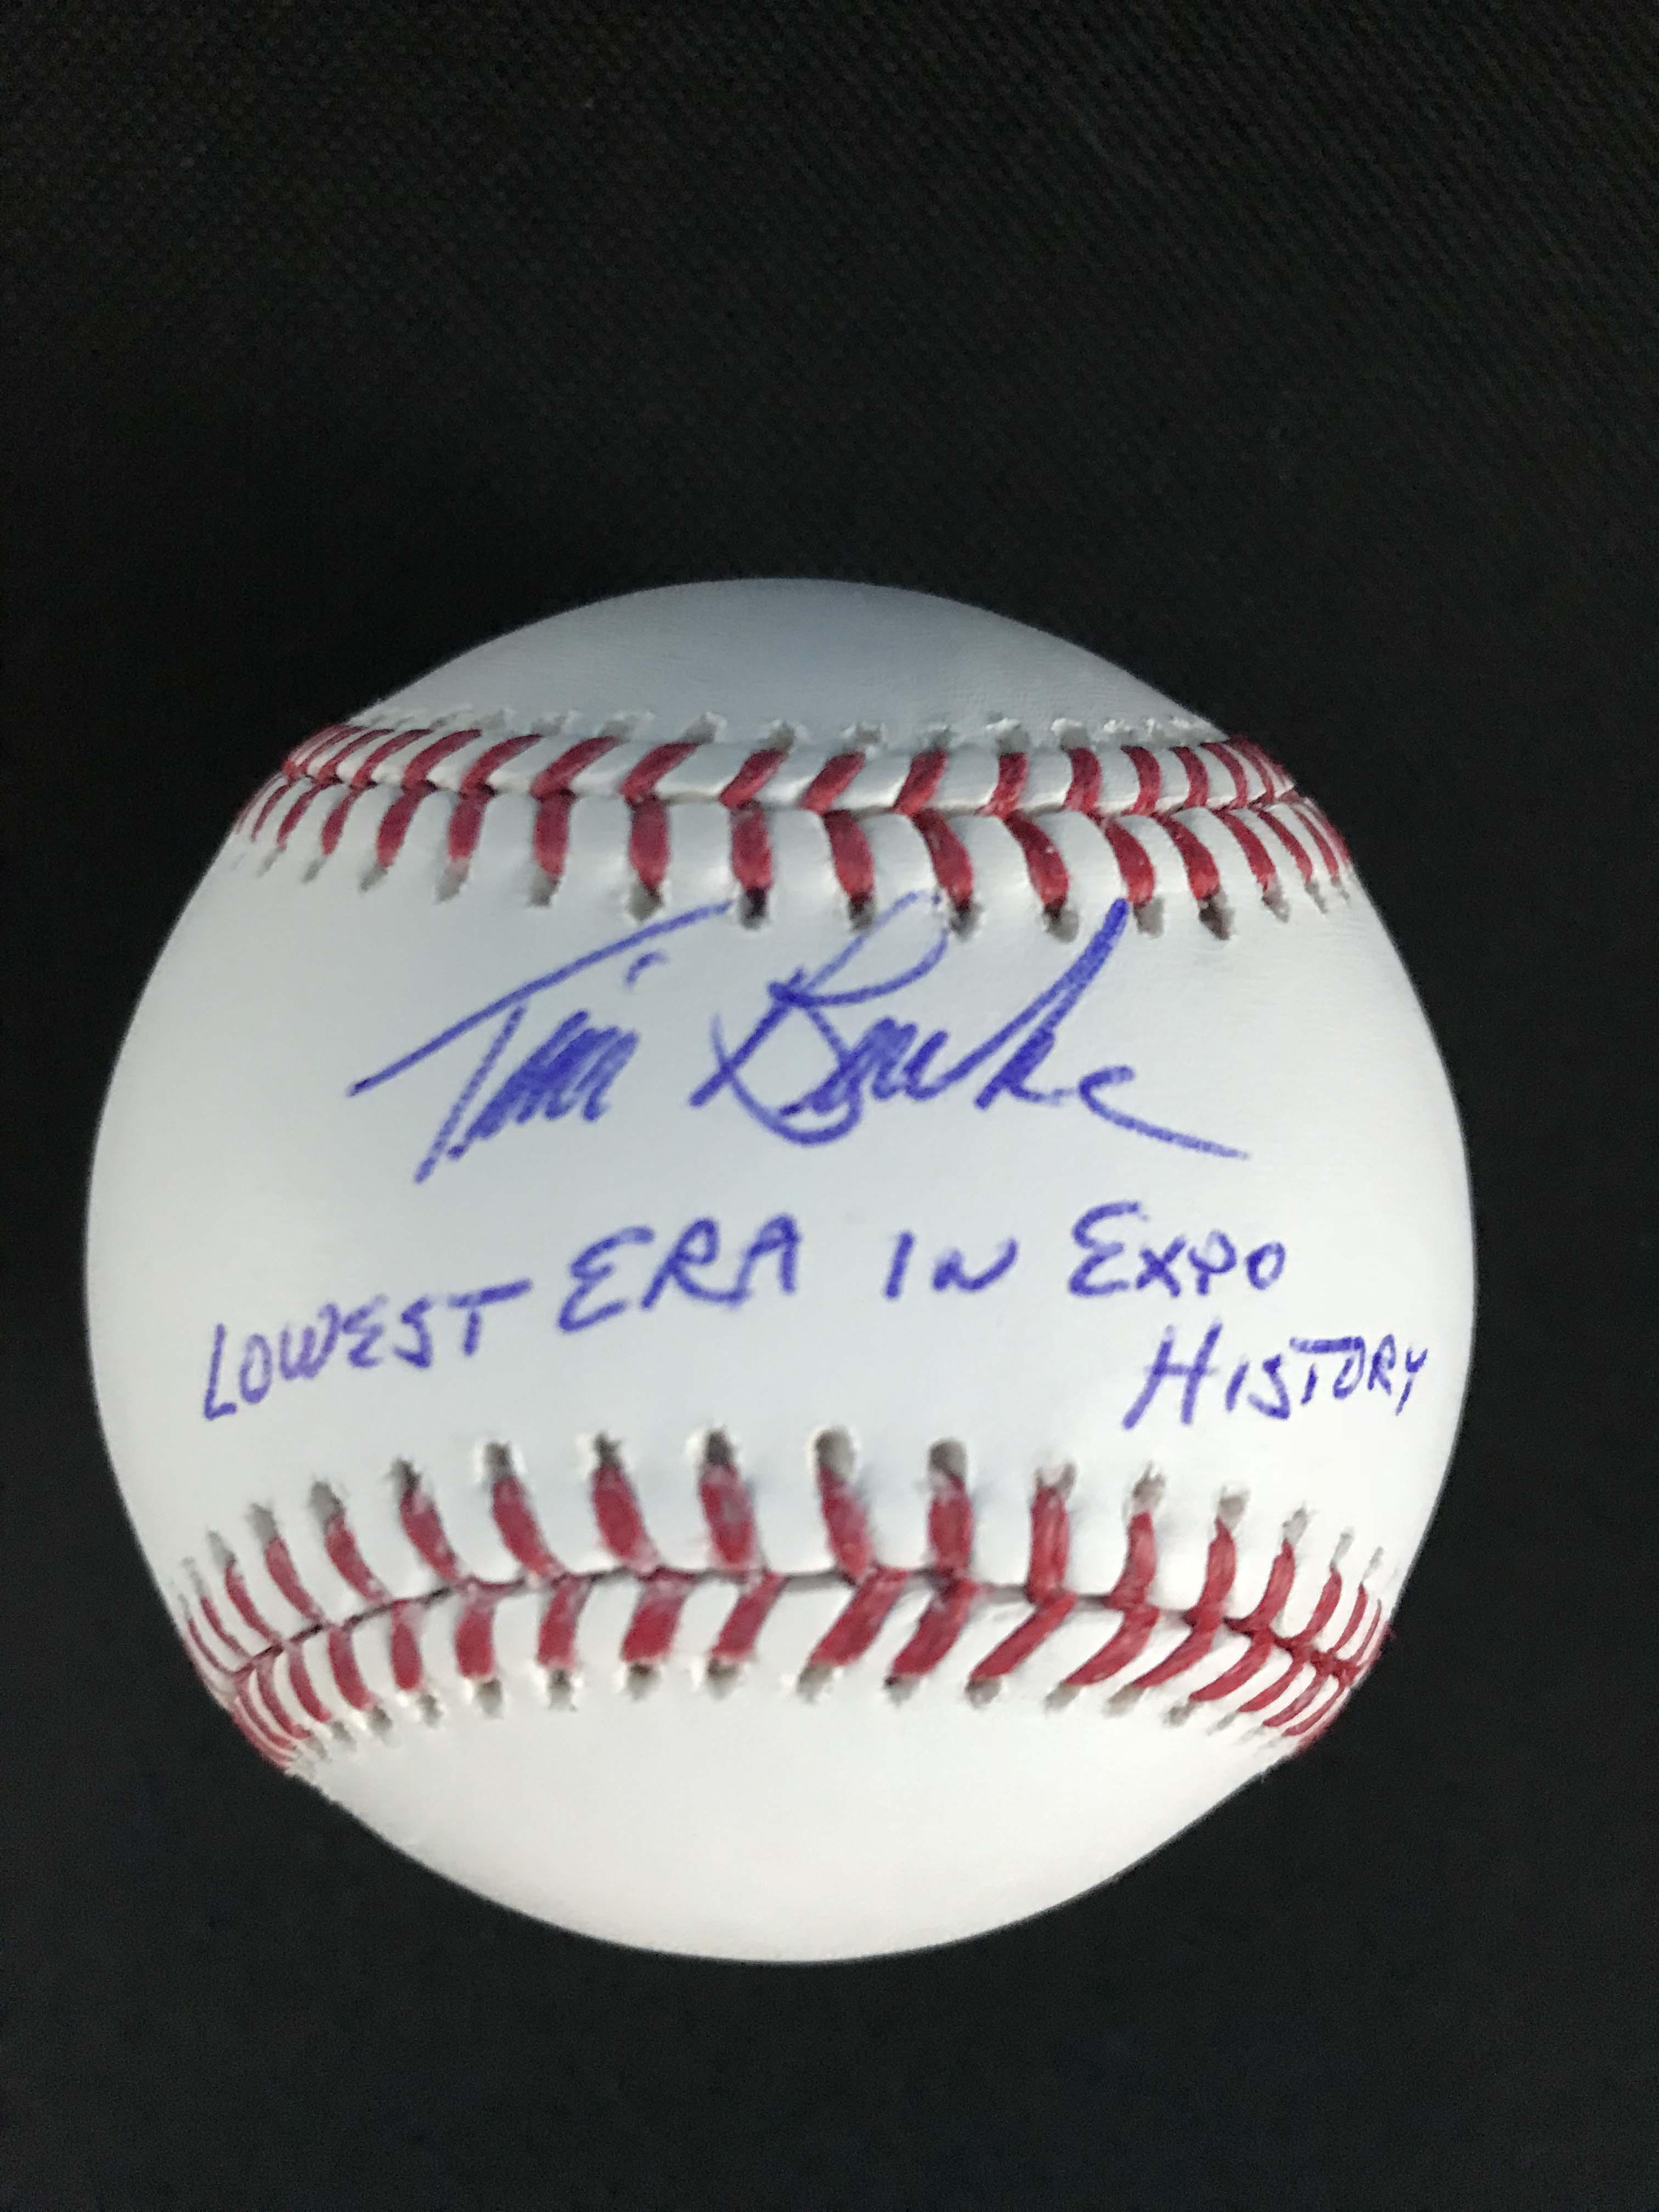 Balle signée par Tim Burke